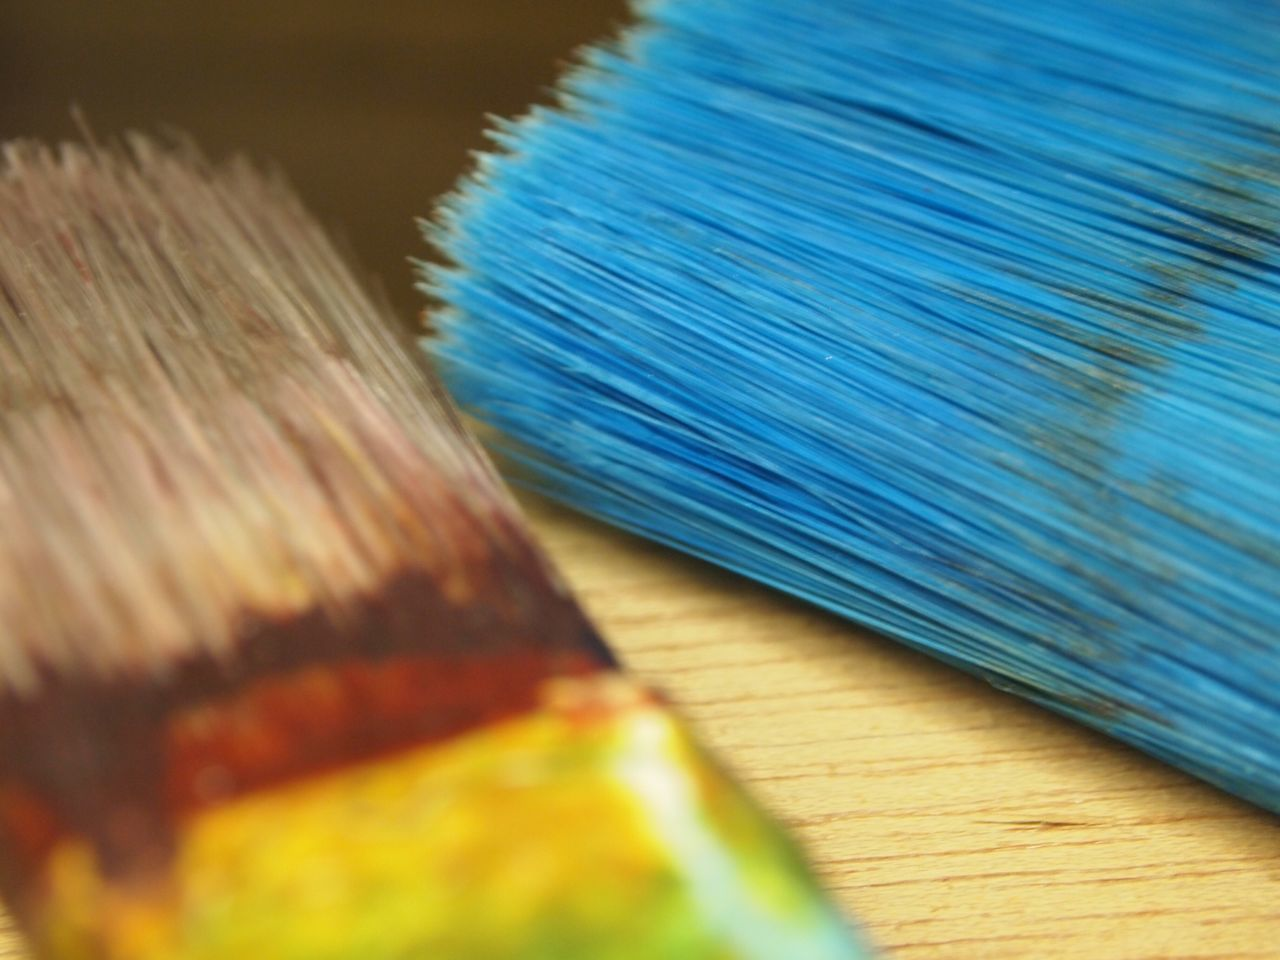 Paint Close-up Paintbrush Workshop Indoors  No People Day Multi Colored Blue Art Crafts Palette Oil Paint